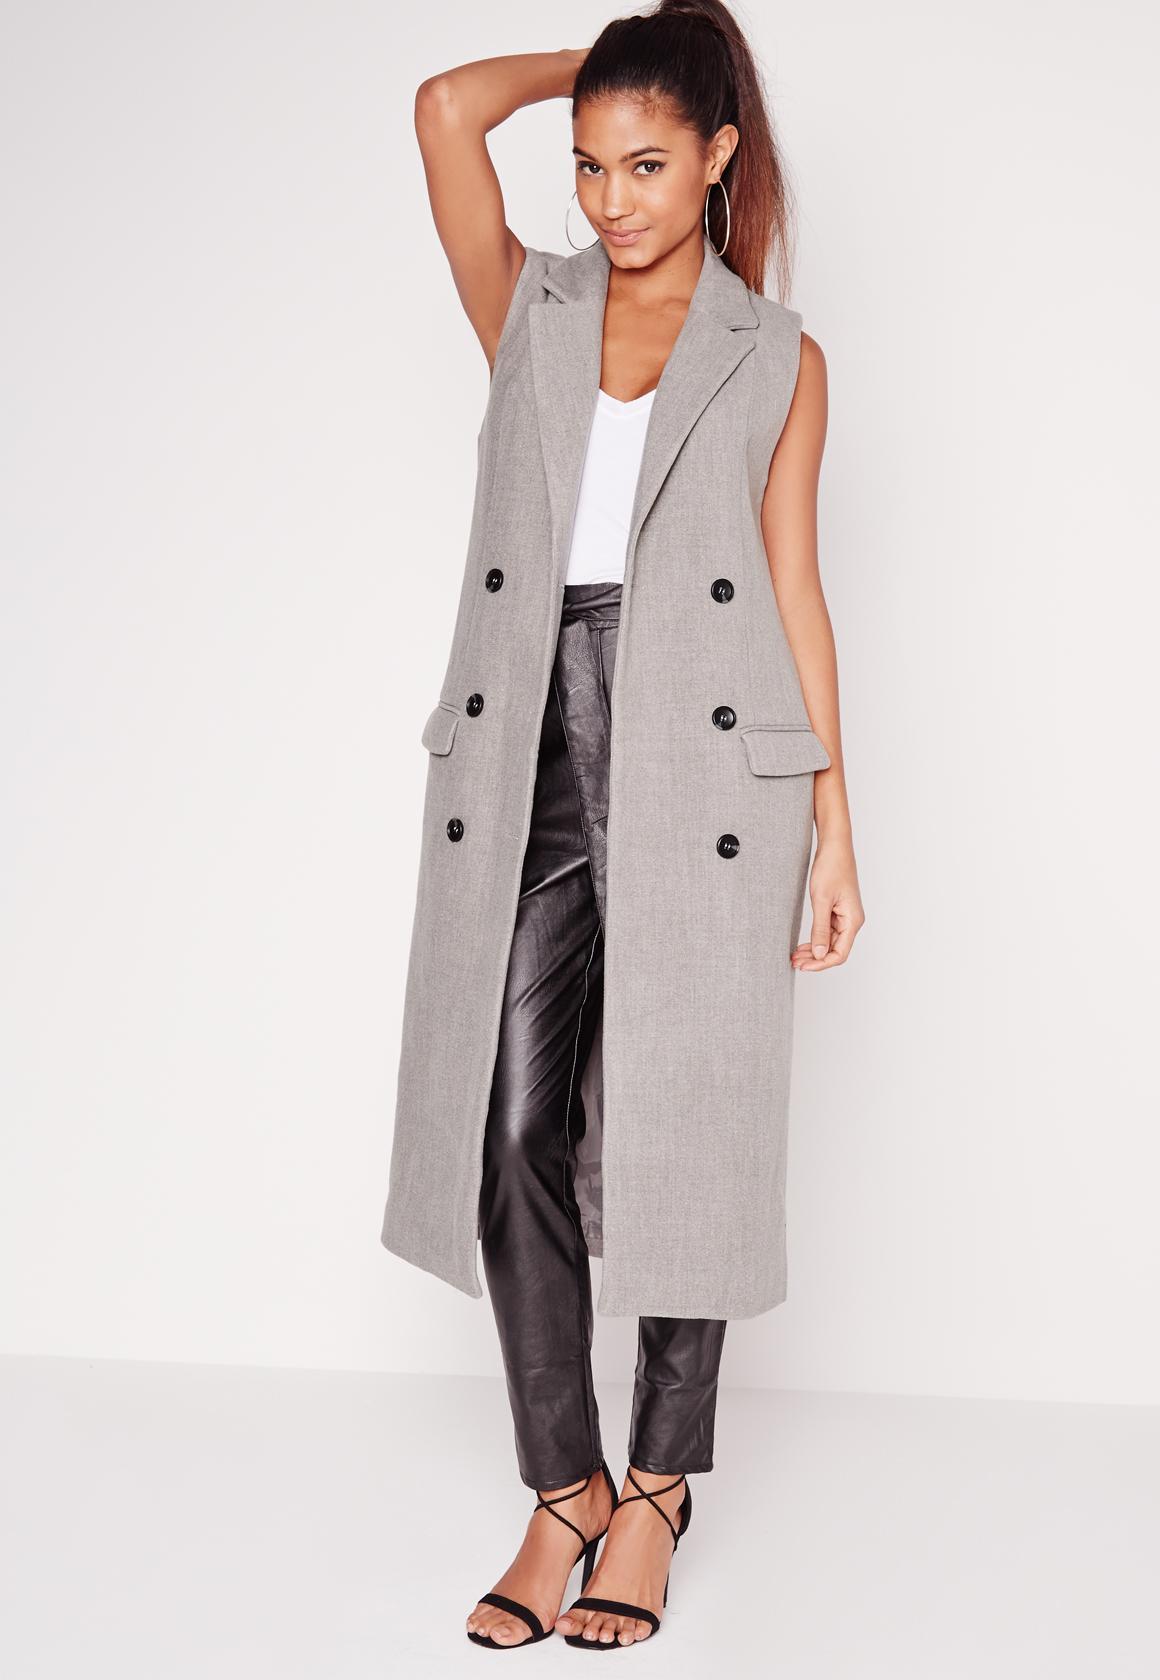 9868441f62564 Double breasted sleeveless wool maxi coat grey missguided jpg 1160x1680 Grey  sleeveless coat